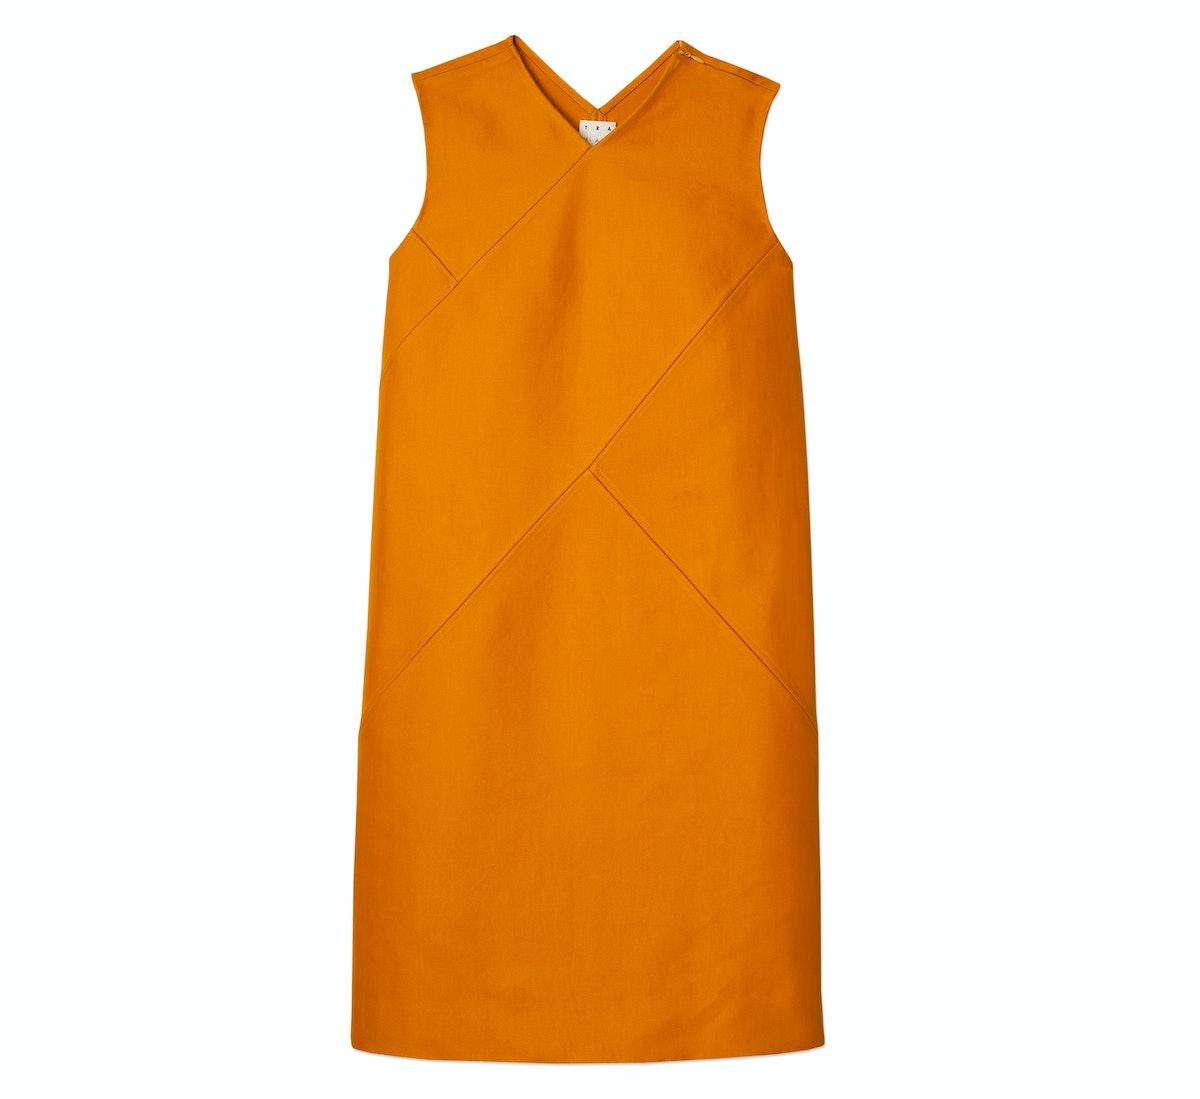 Trademark dress